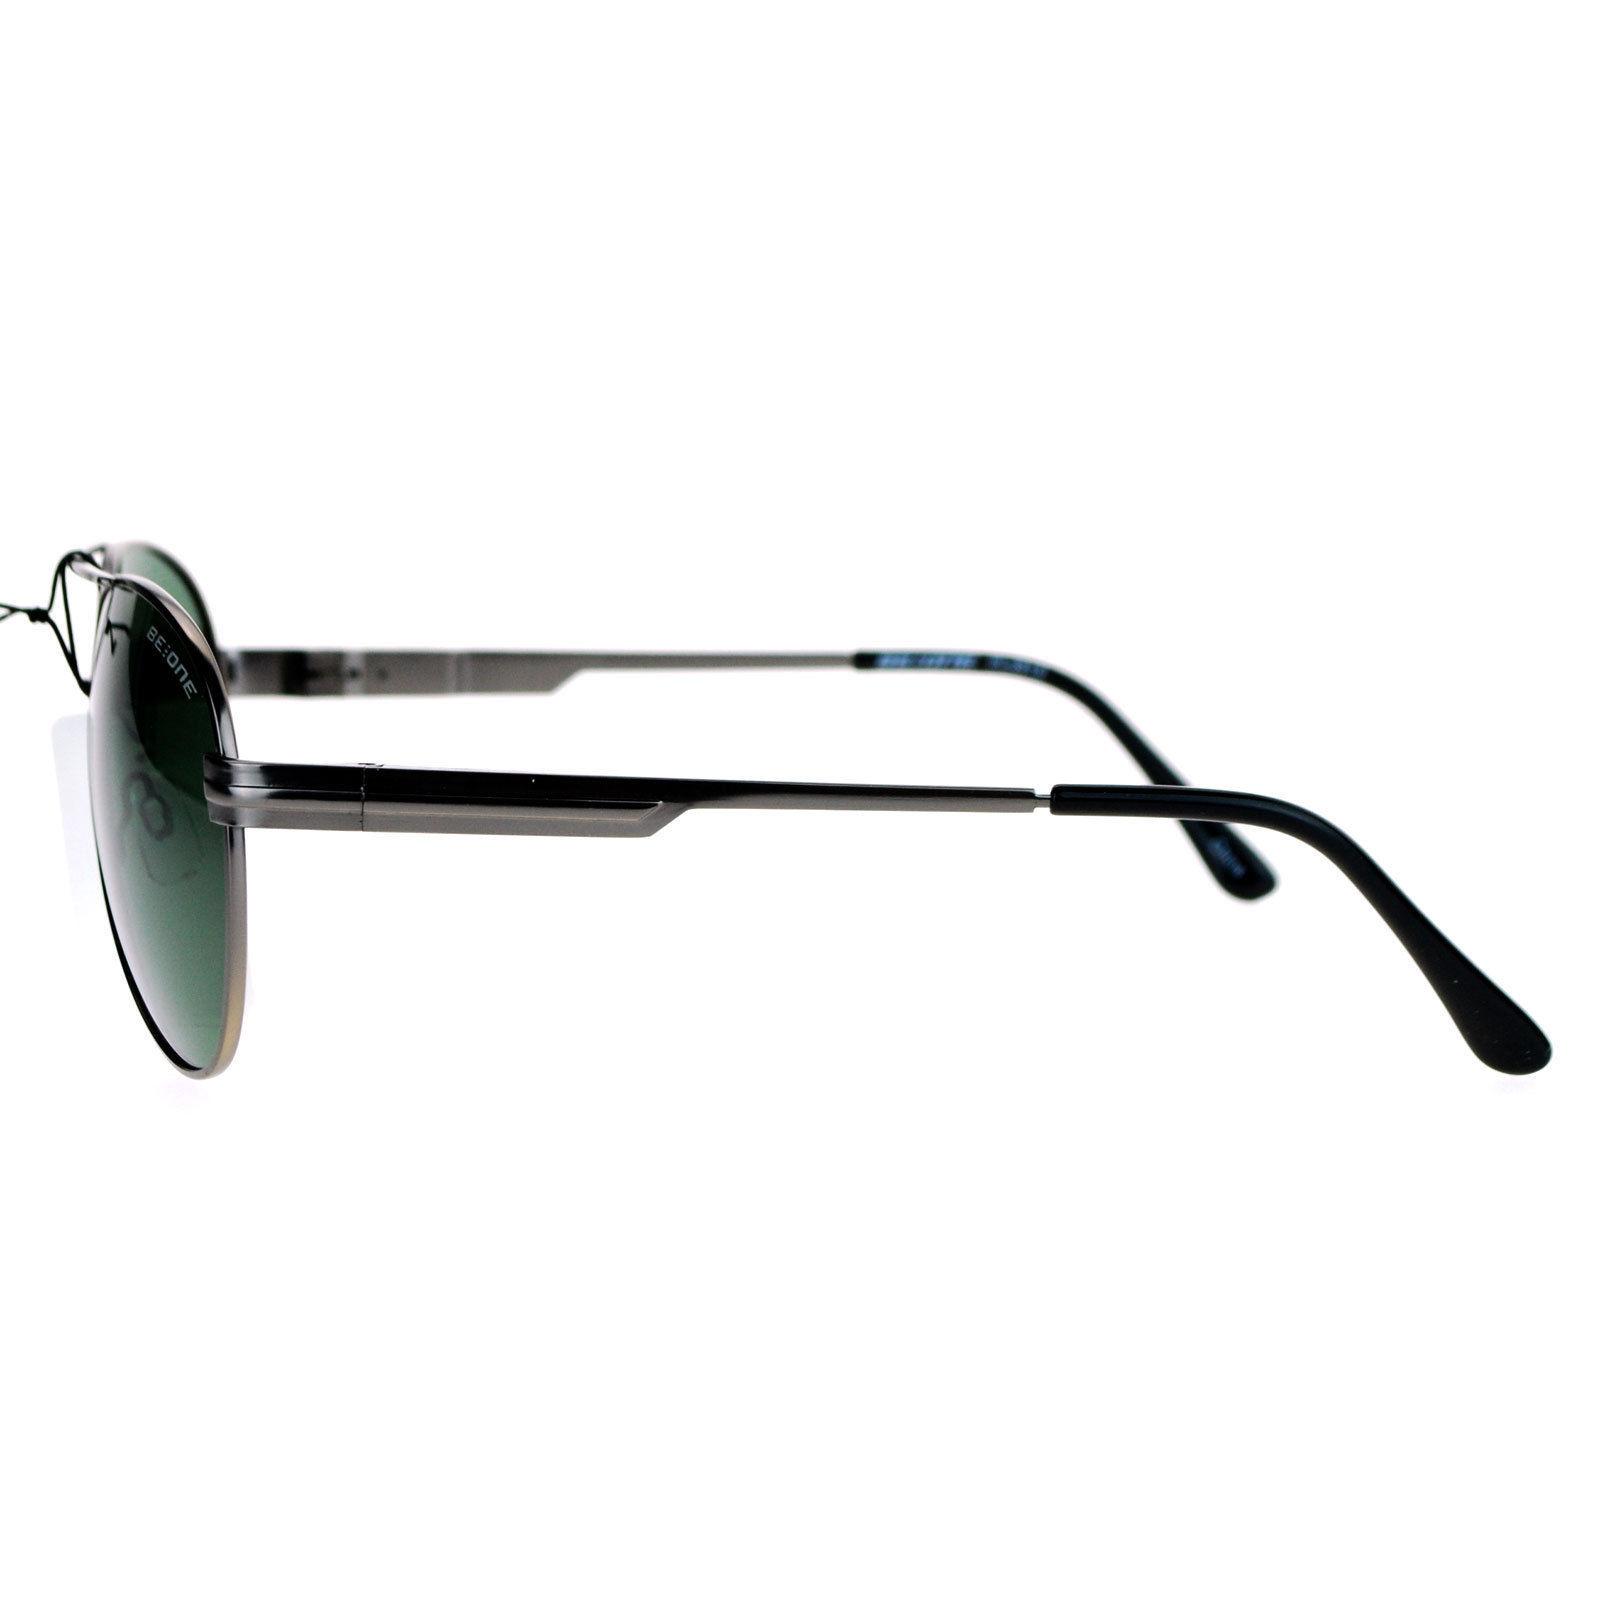 Be One Polarized Lens Aviator Sunglasses Metal Frame Spring Hinge